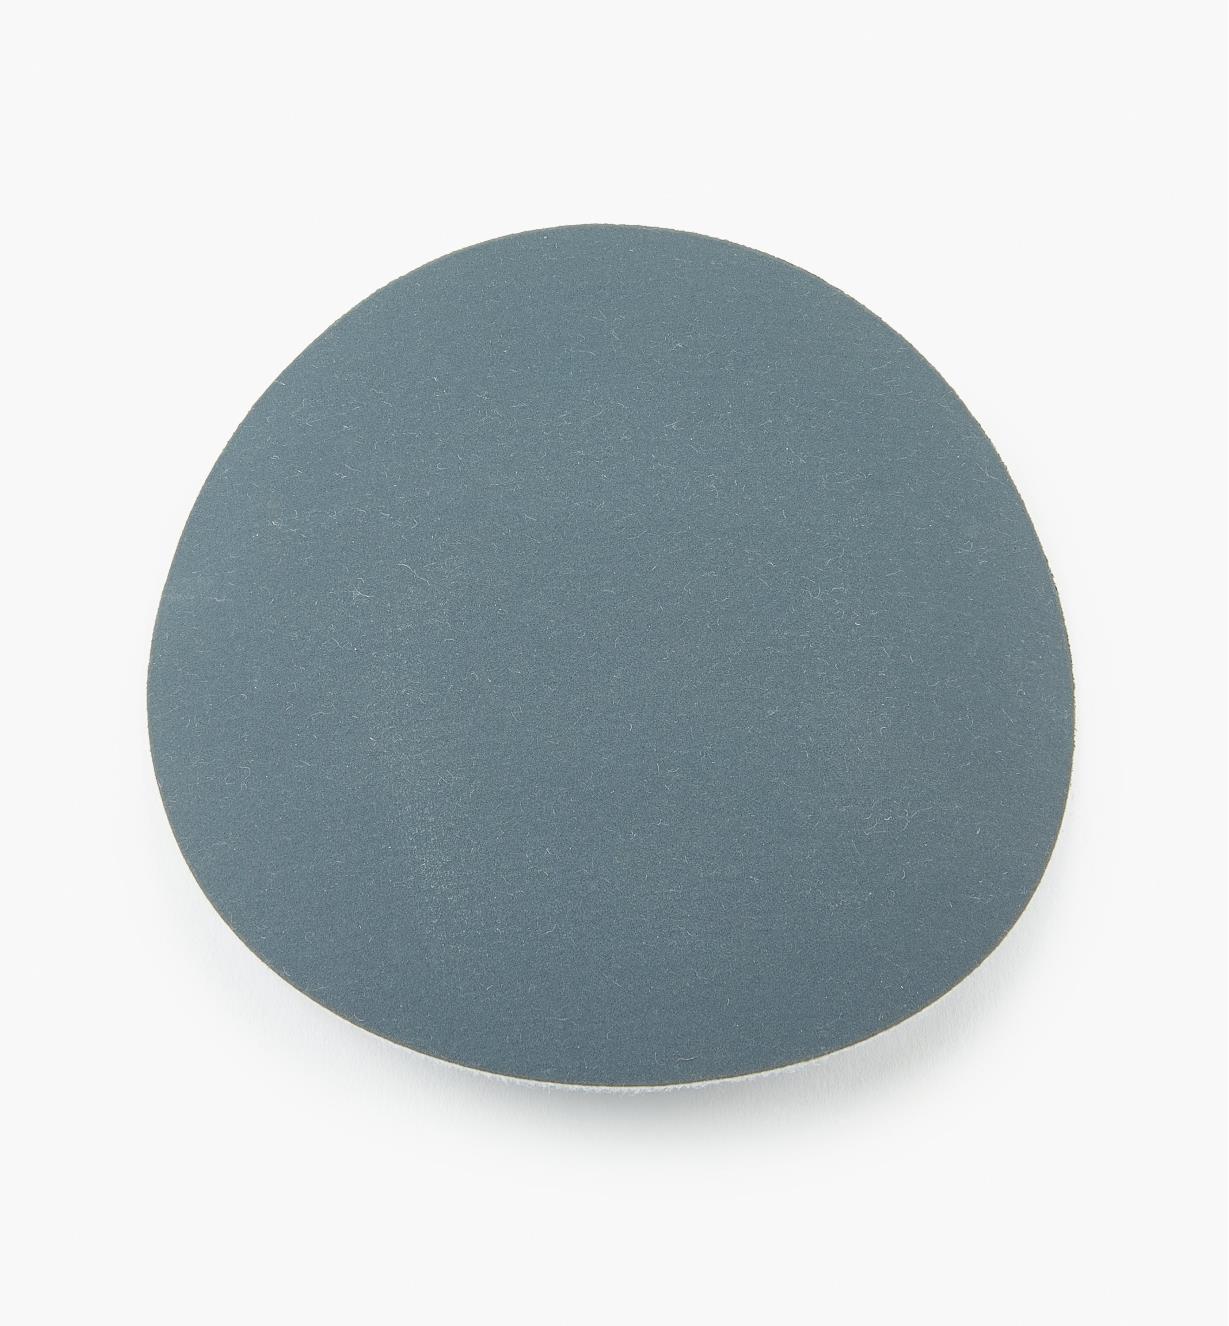 54K9034 - 4000x Micro-Mesh Disc, ea.